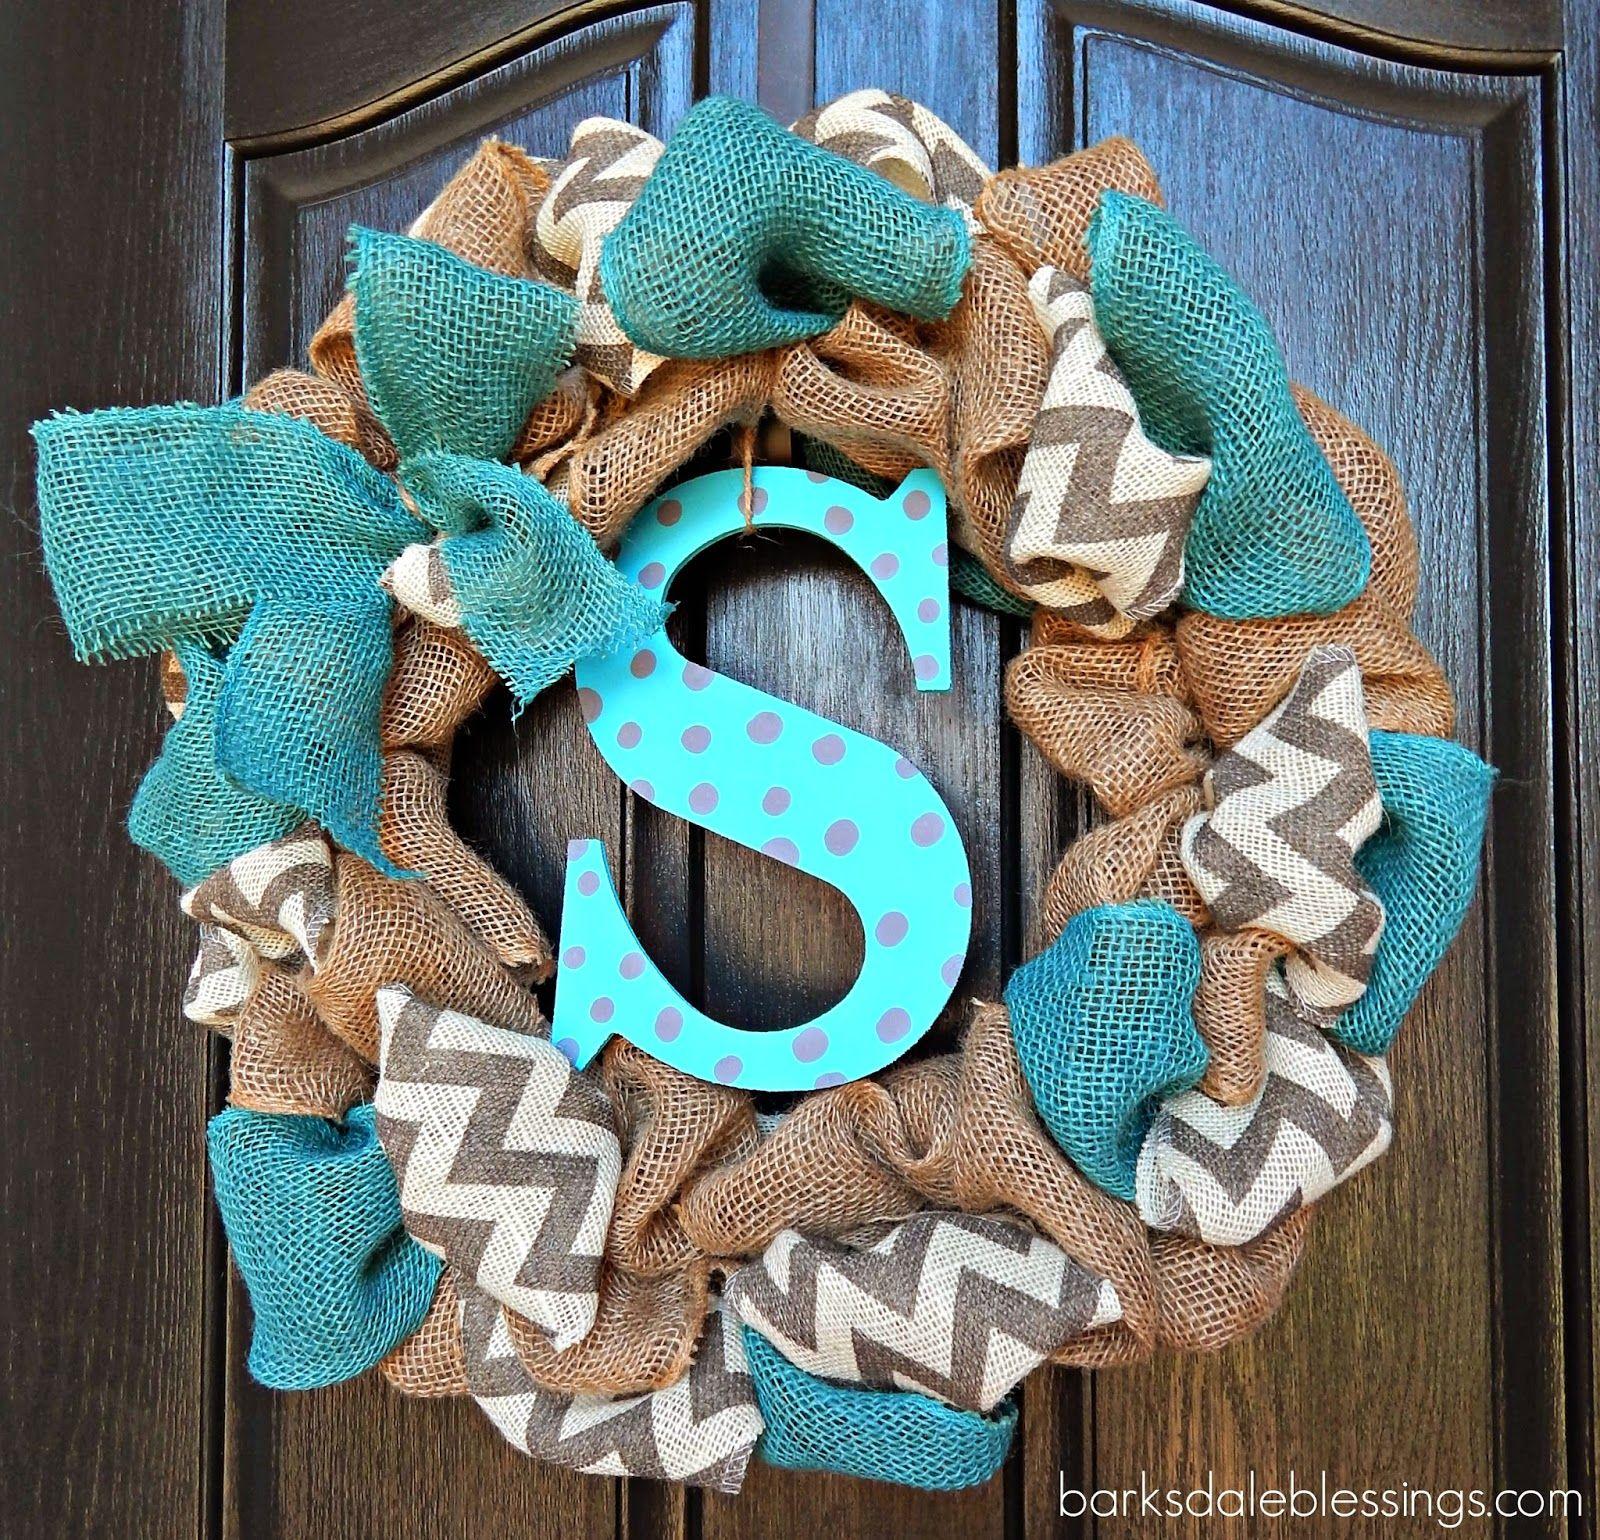 Barksdale Blessings: DIY Burlap Ribbon Wreath   Pinworthy Projects ...